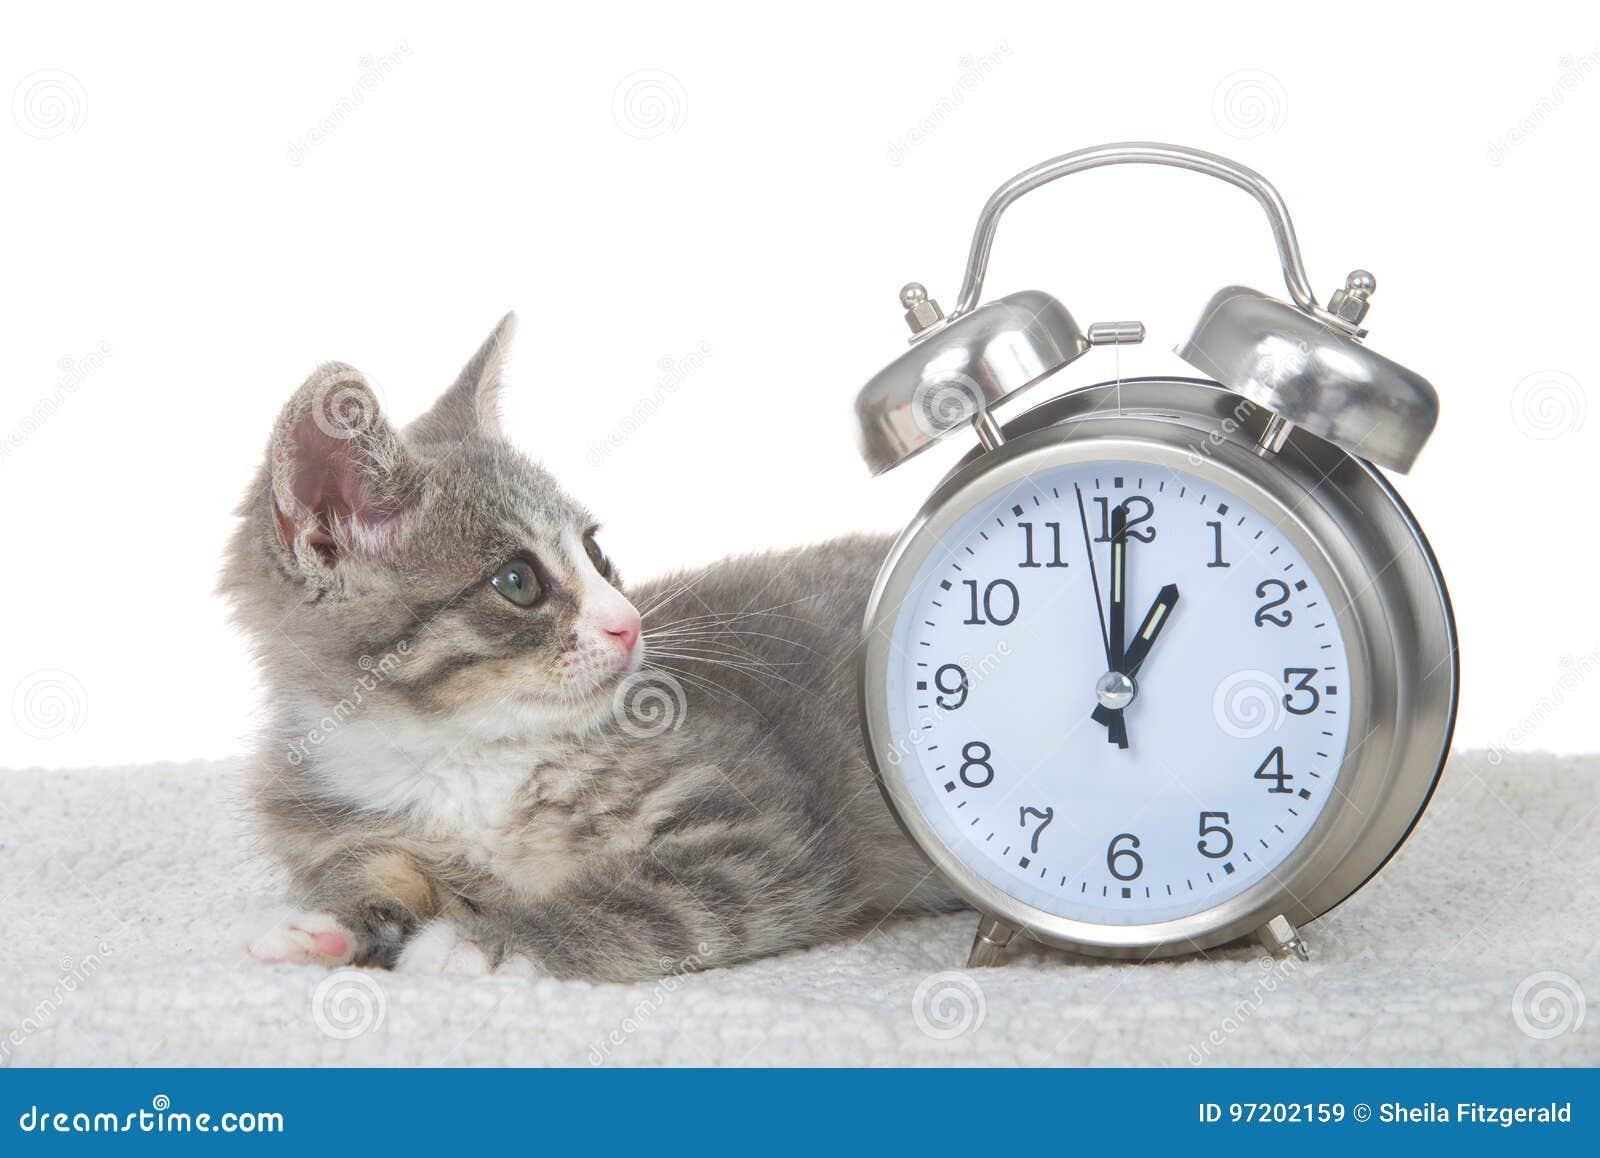 Tabby kitten laying on sheepskin blanket by clock, daylight savings concept